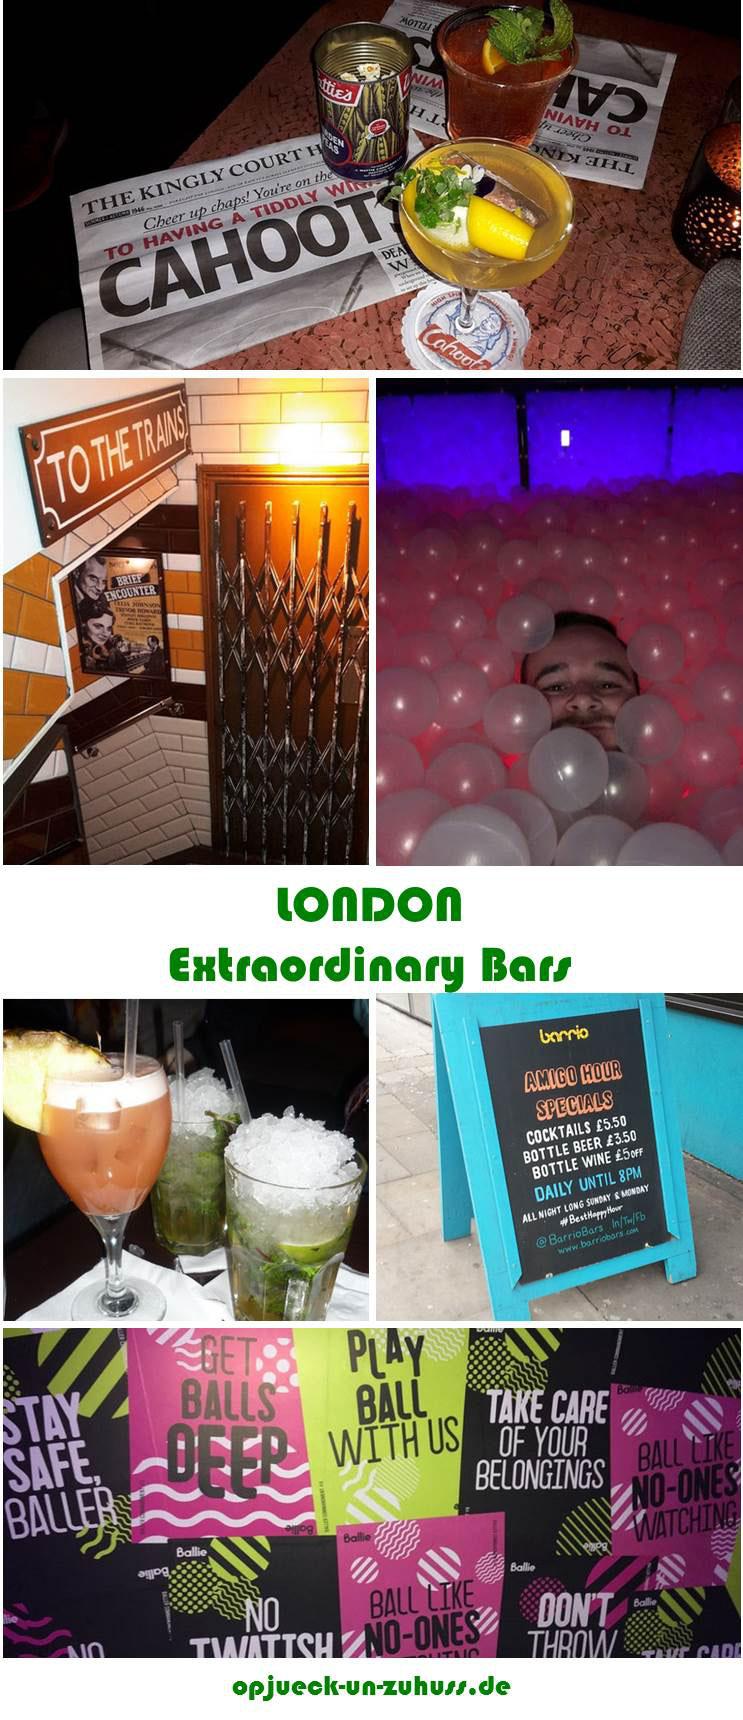 Extraordinary Bars in London